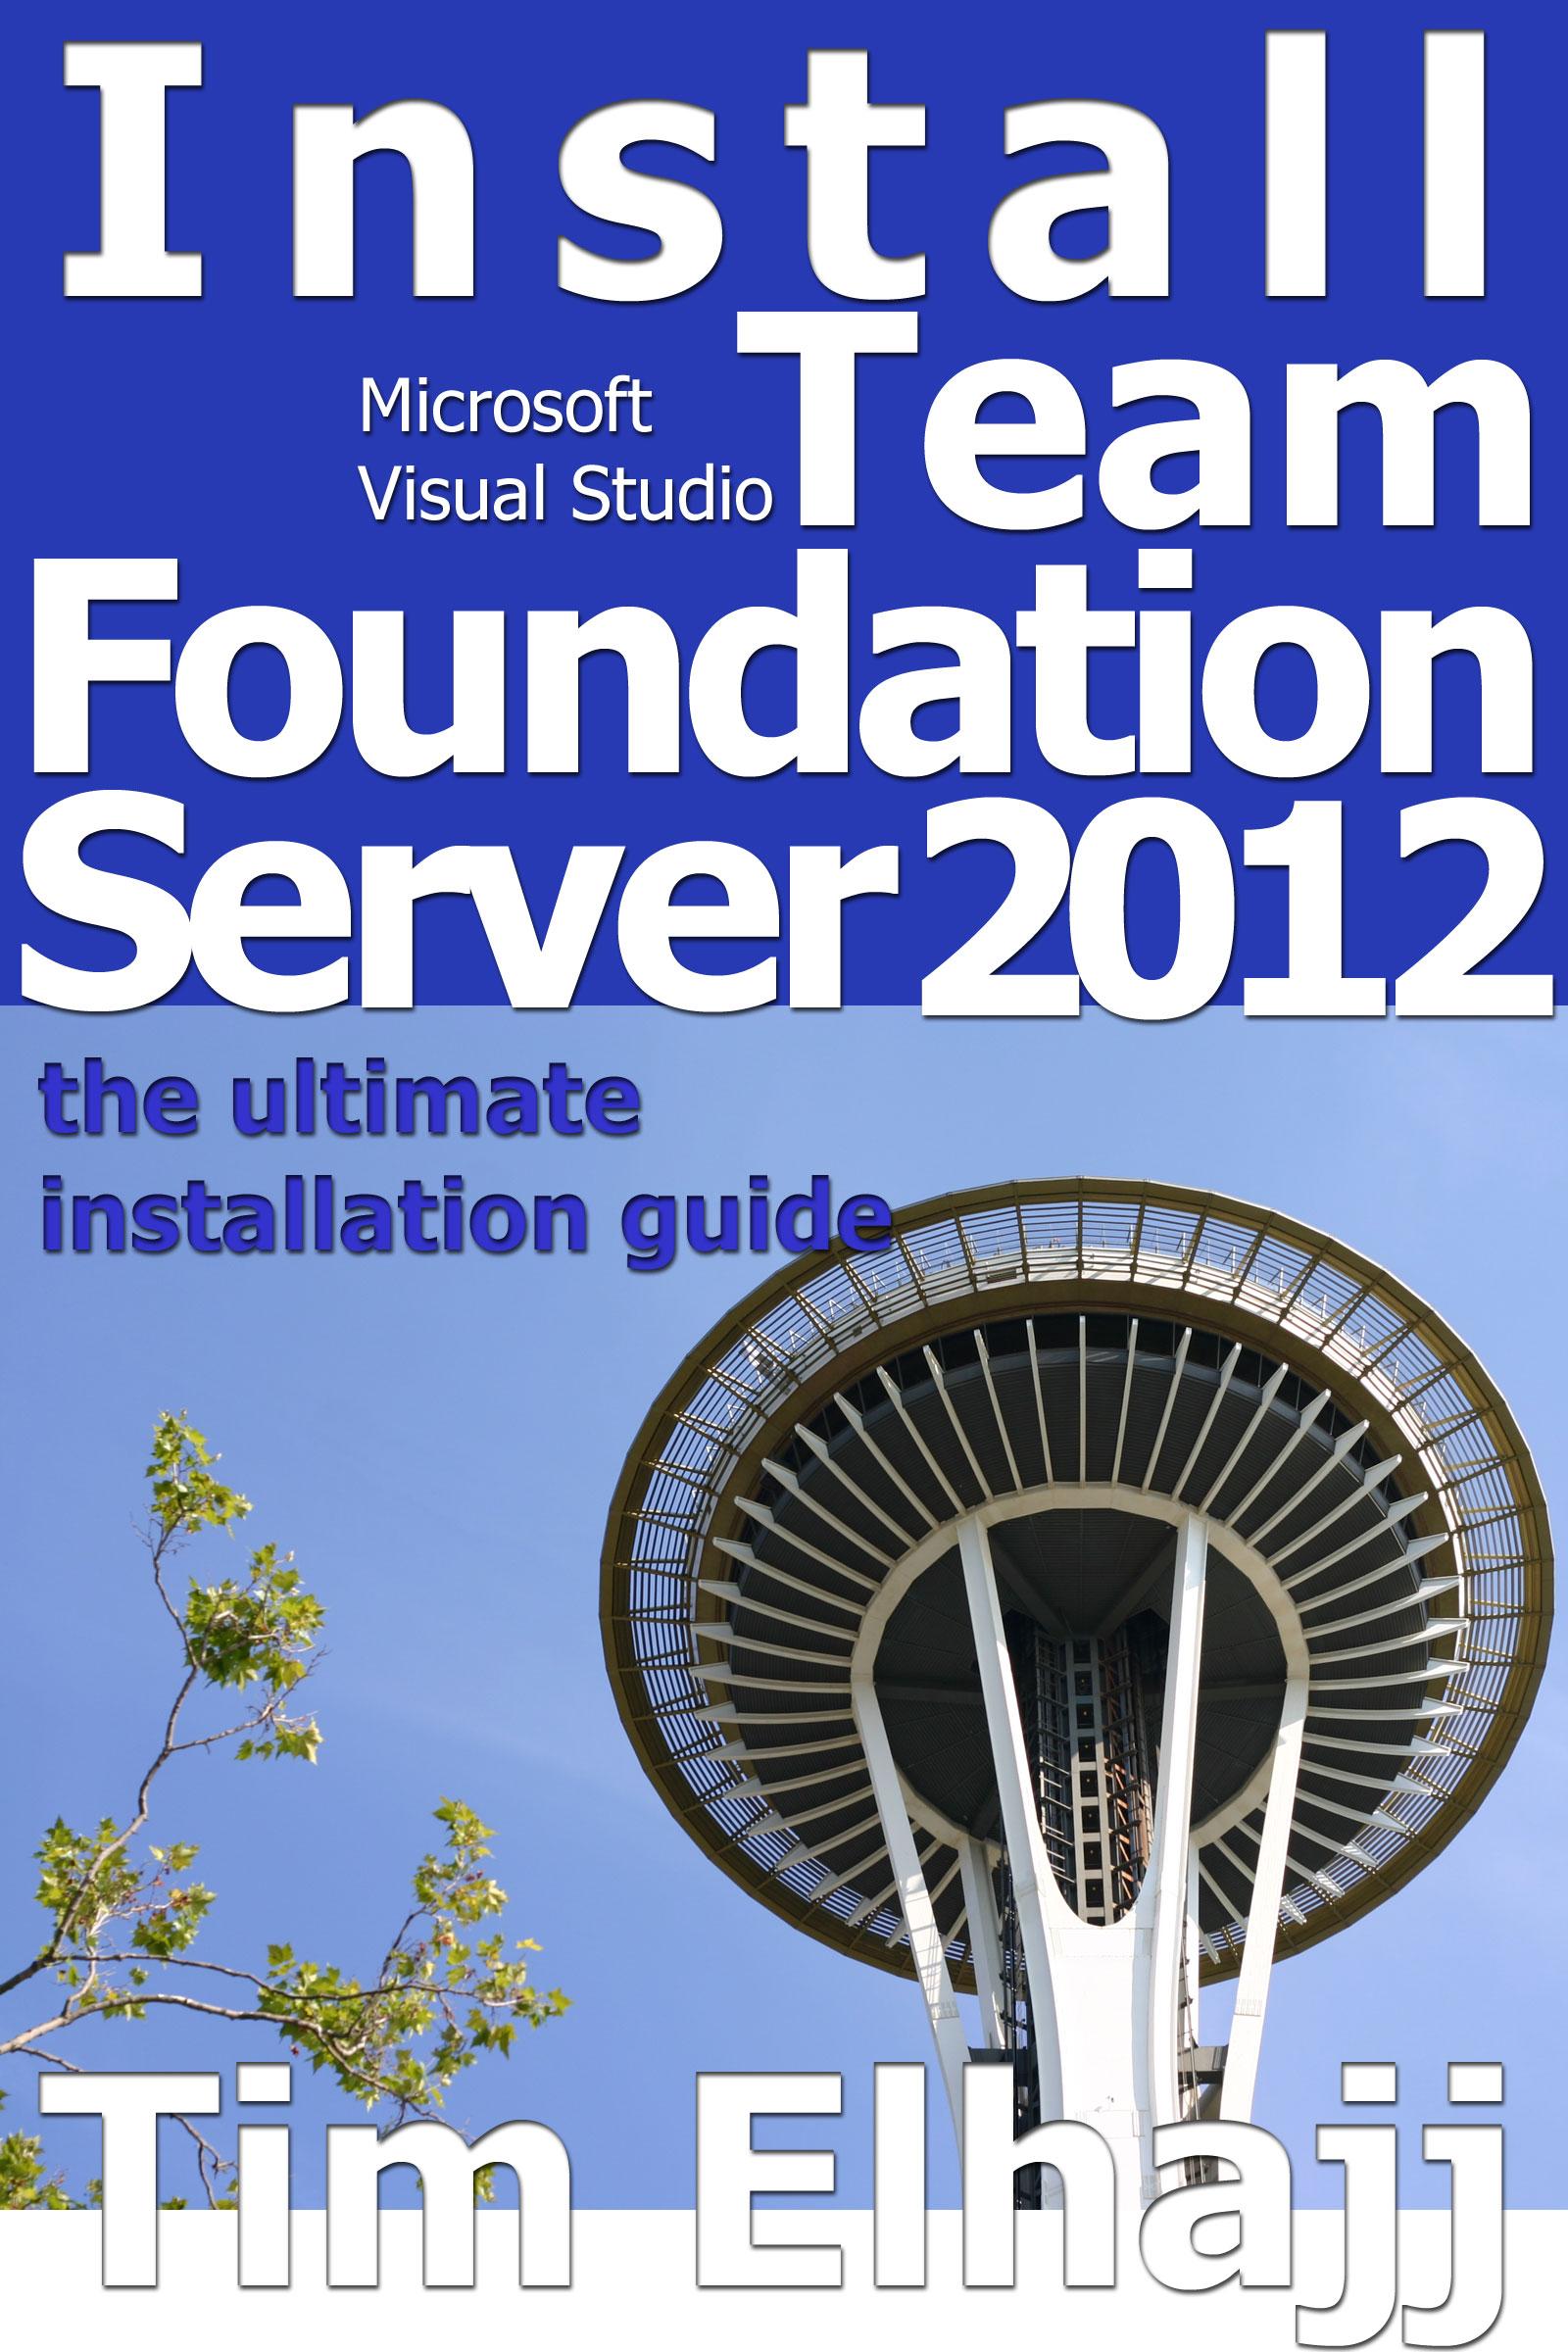 Team foundation server 2012 installation guide.